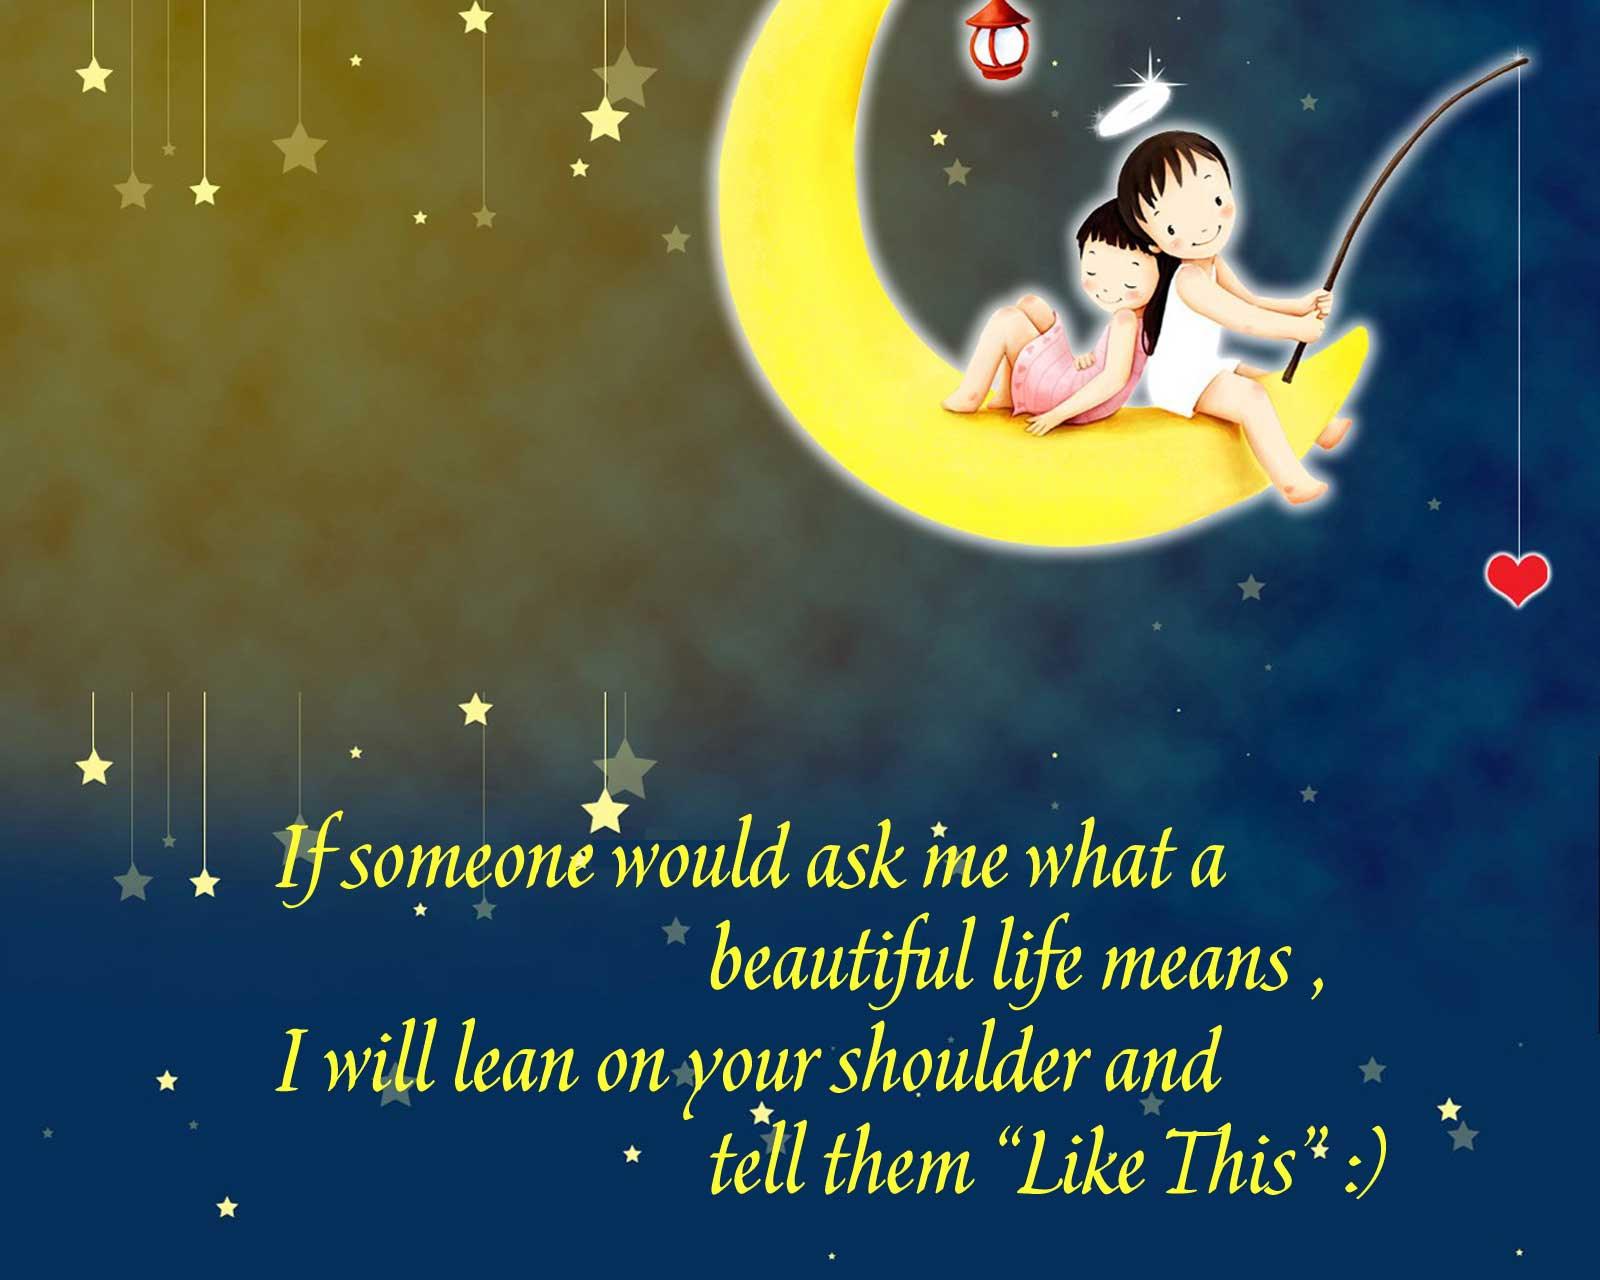 Cute Cartoon Life Quotes Wallpaper Free Download hd